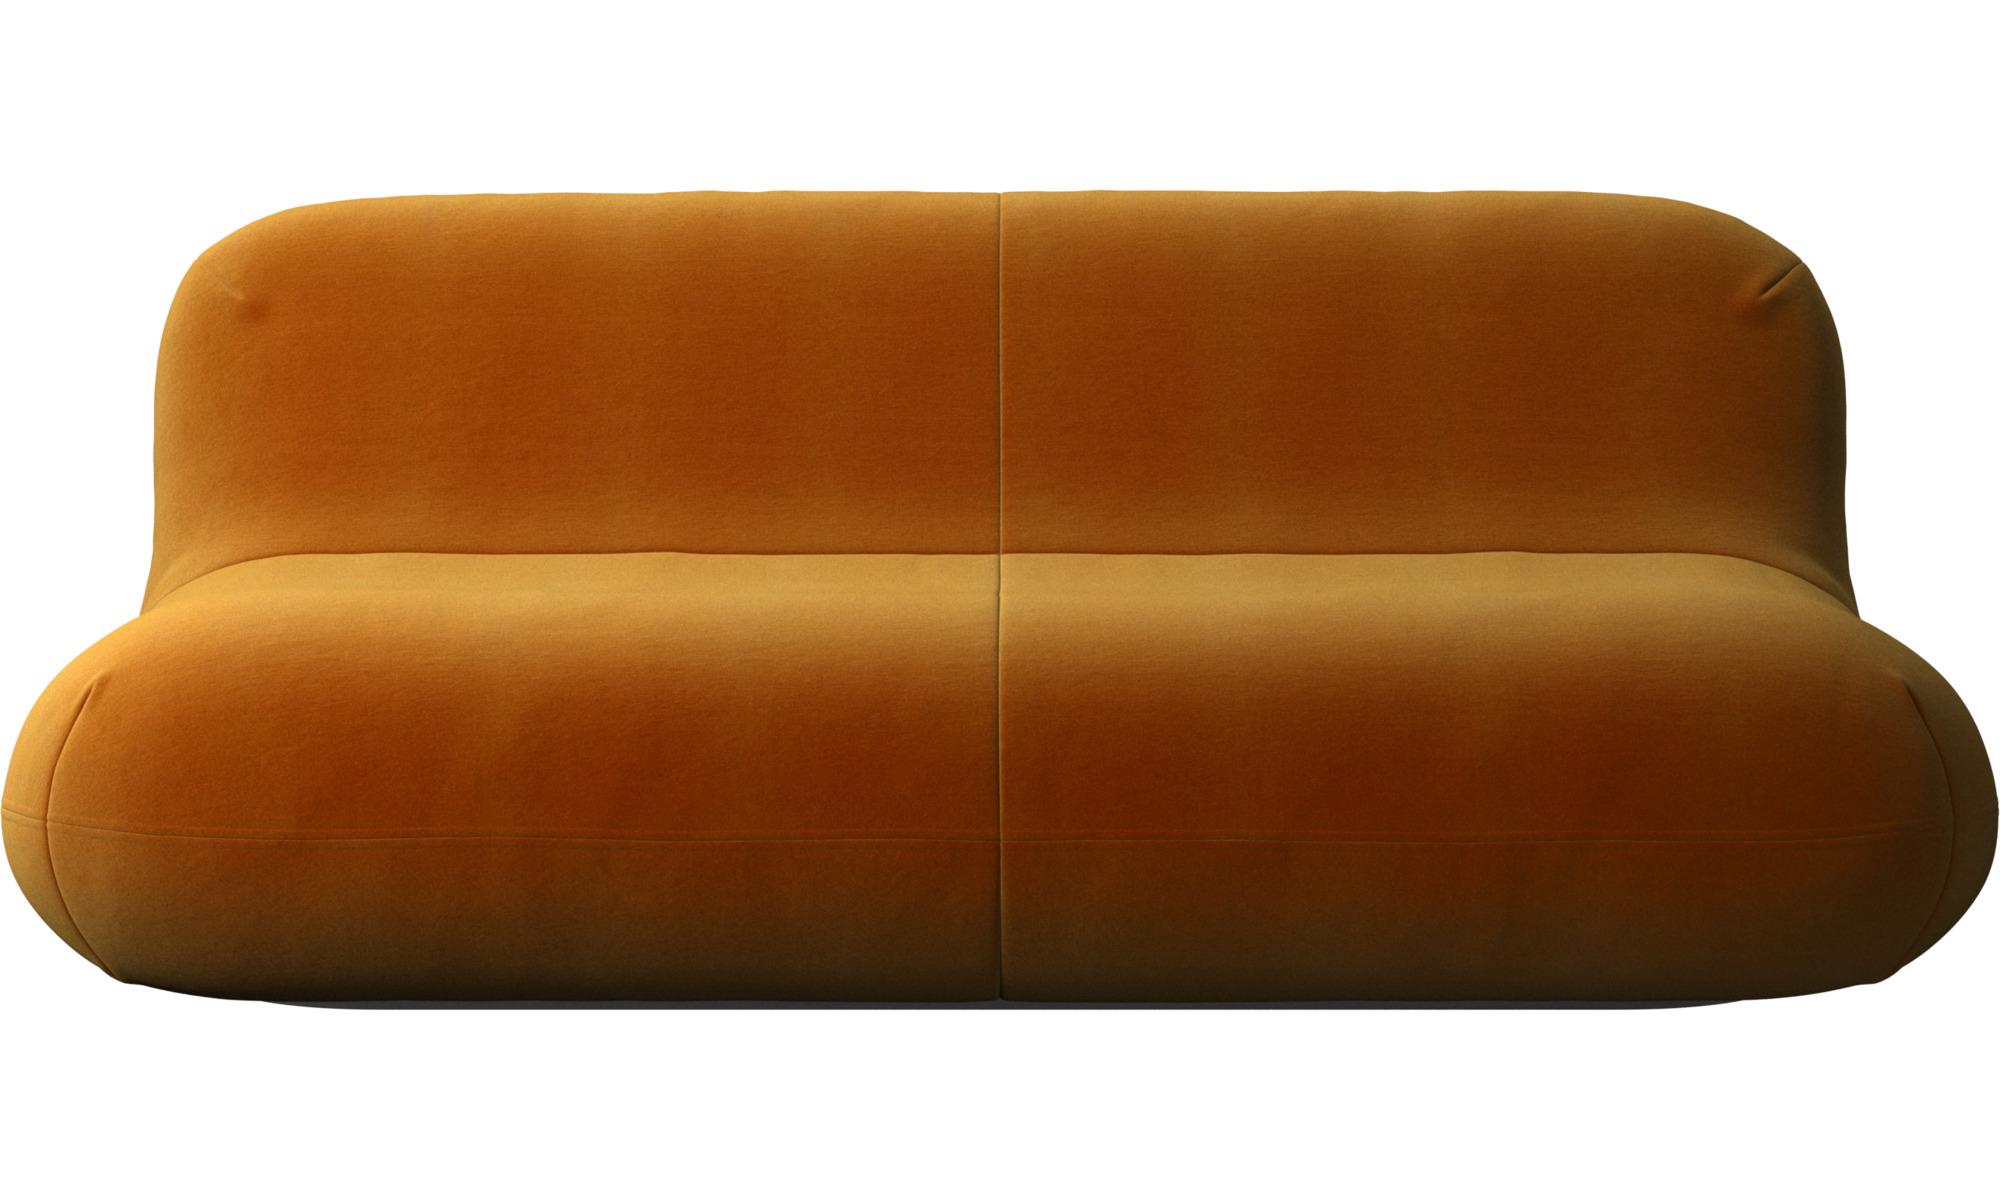 2½ personers sofaer - Chelsea sofa - Gul - Stof